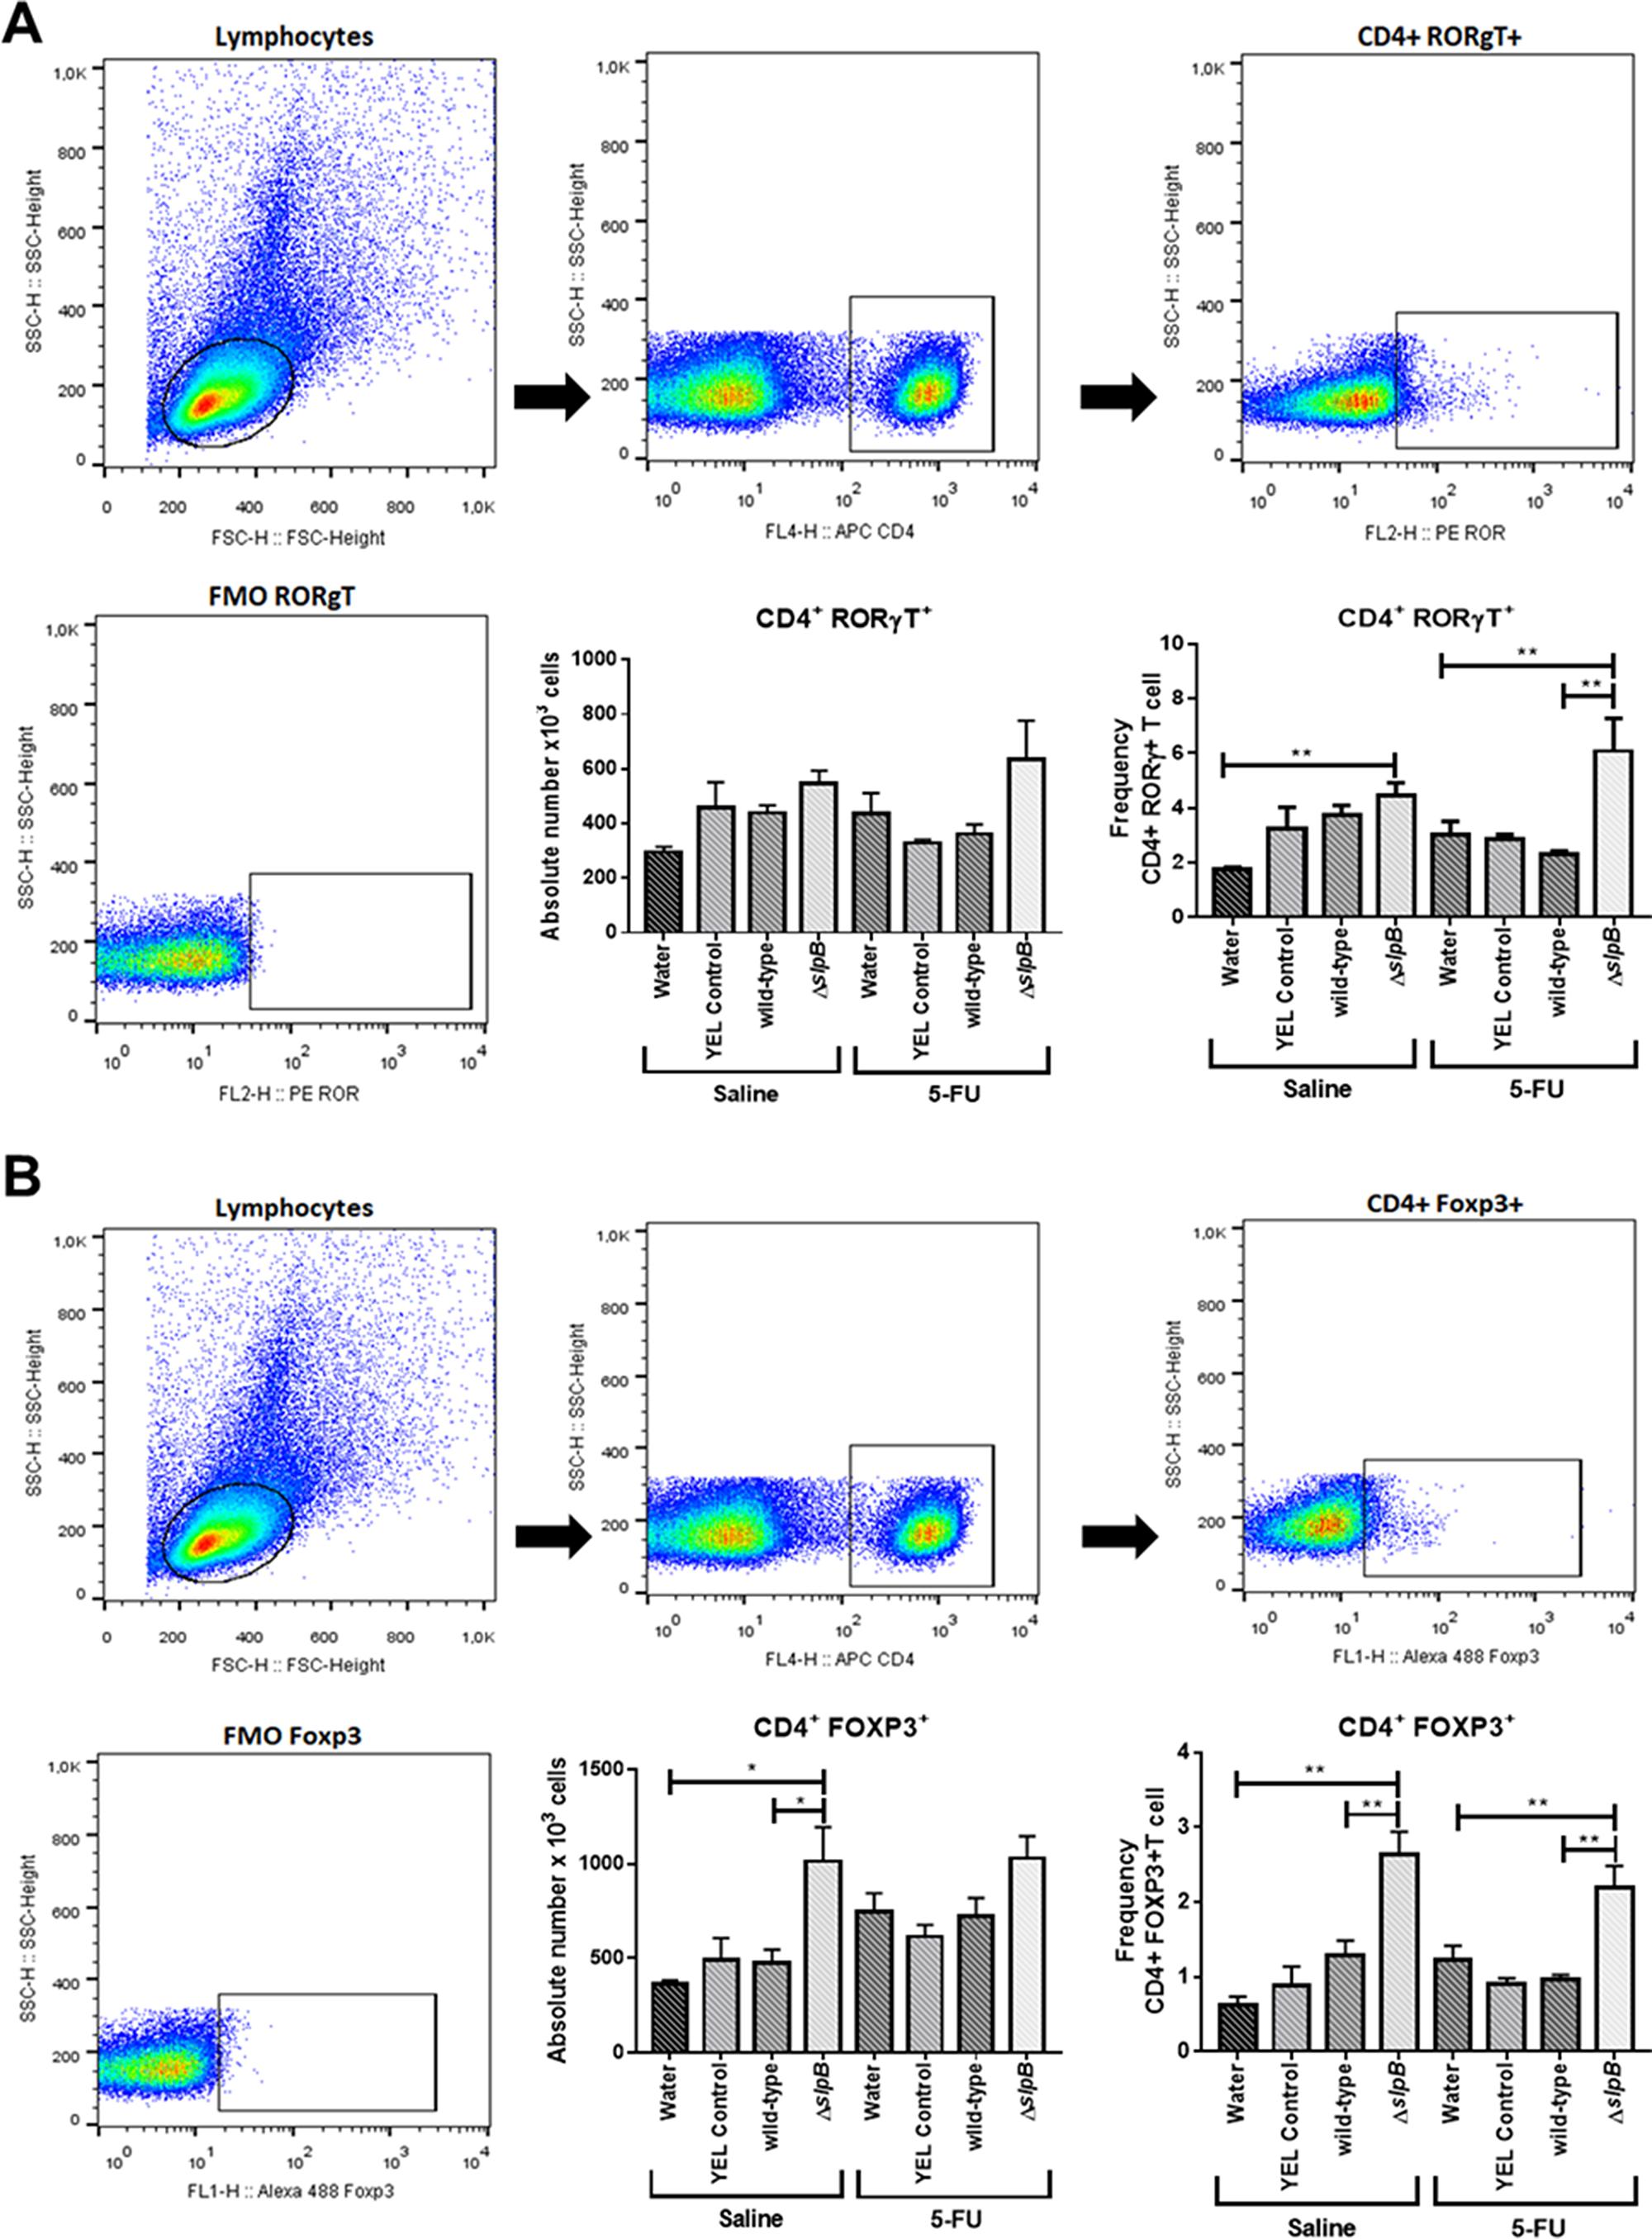 Propionibacterium freudenreichii ΔslpB mutant strain induces T lymphocyte production in mice spleen after 5-FU-induced mucositis.